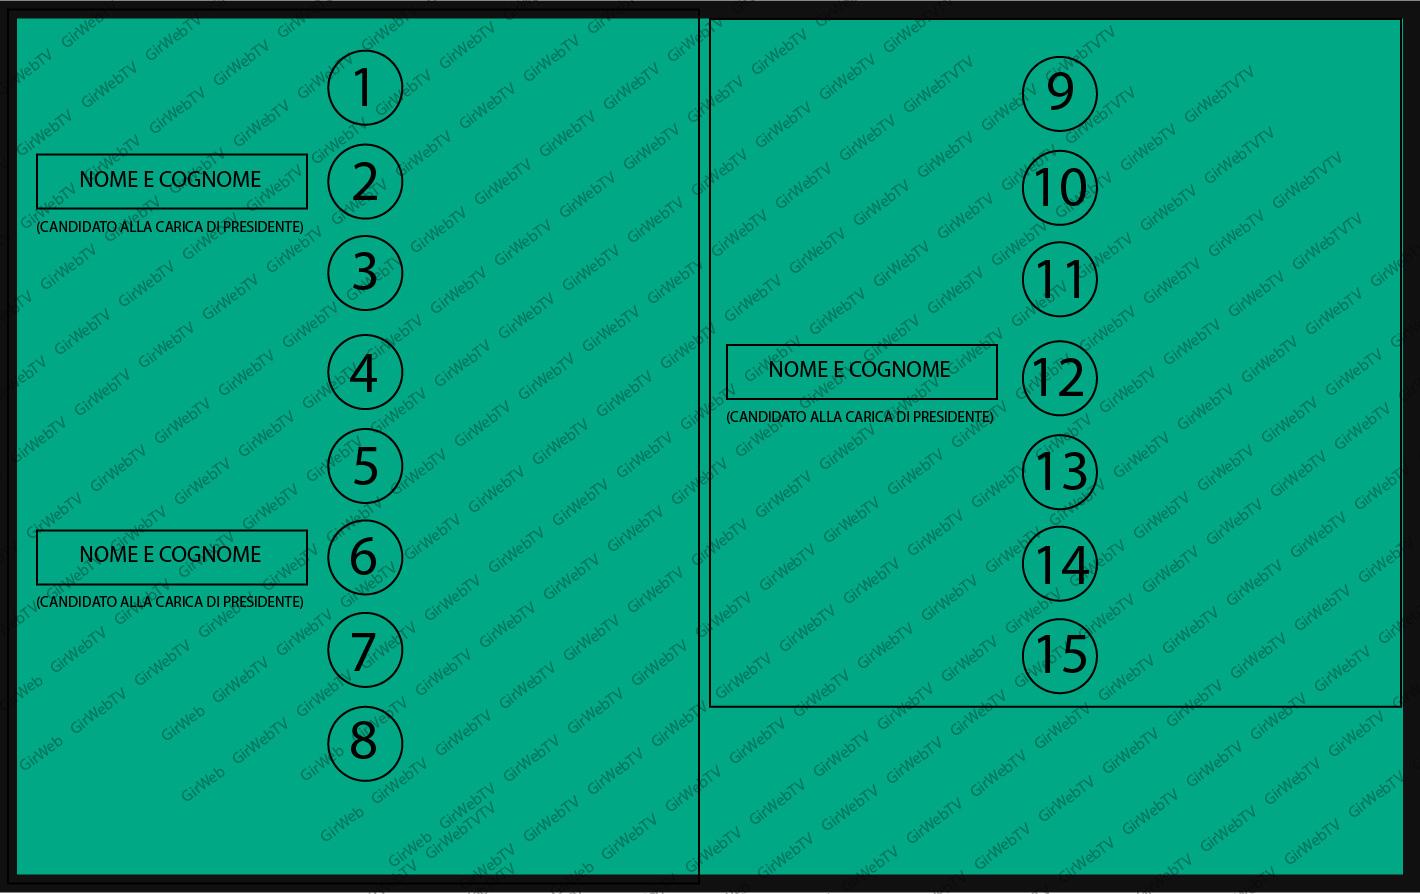 fac-simile-scheda-elettorale-regionali-2015-2